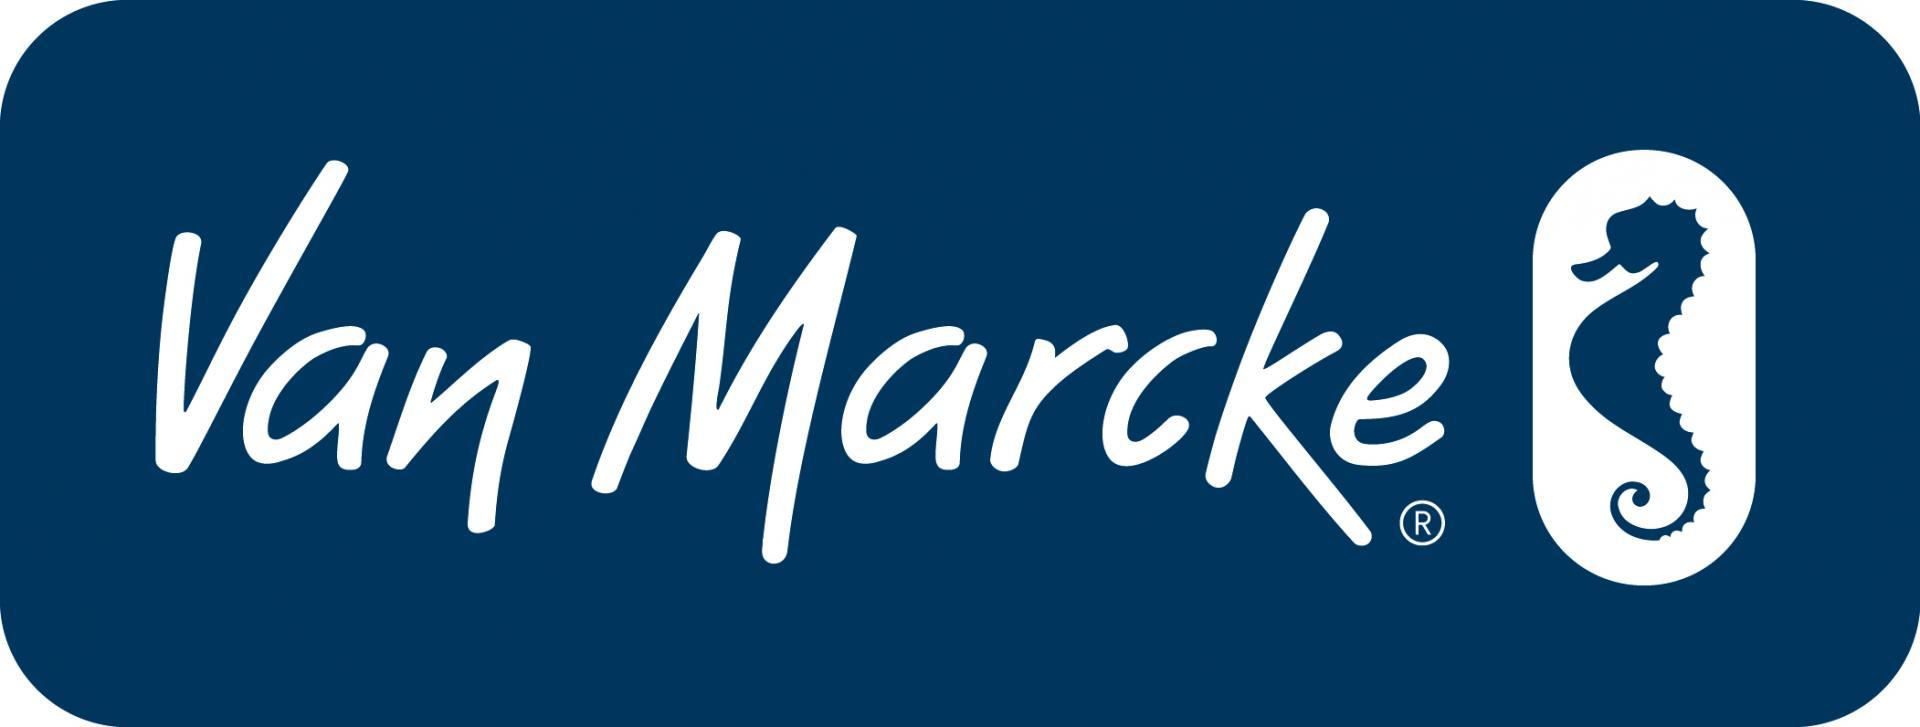 Vanmarcke logo